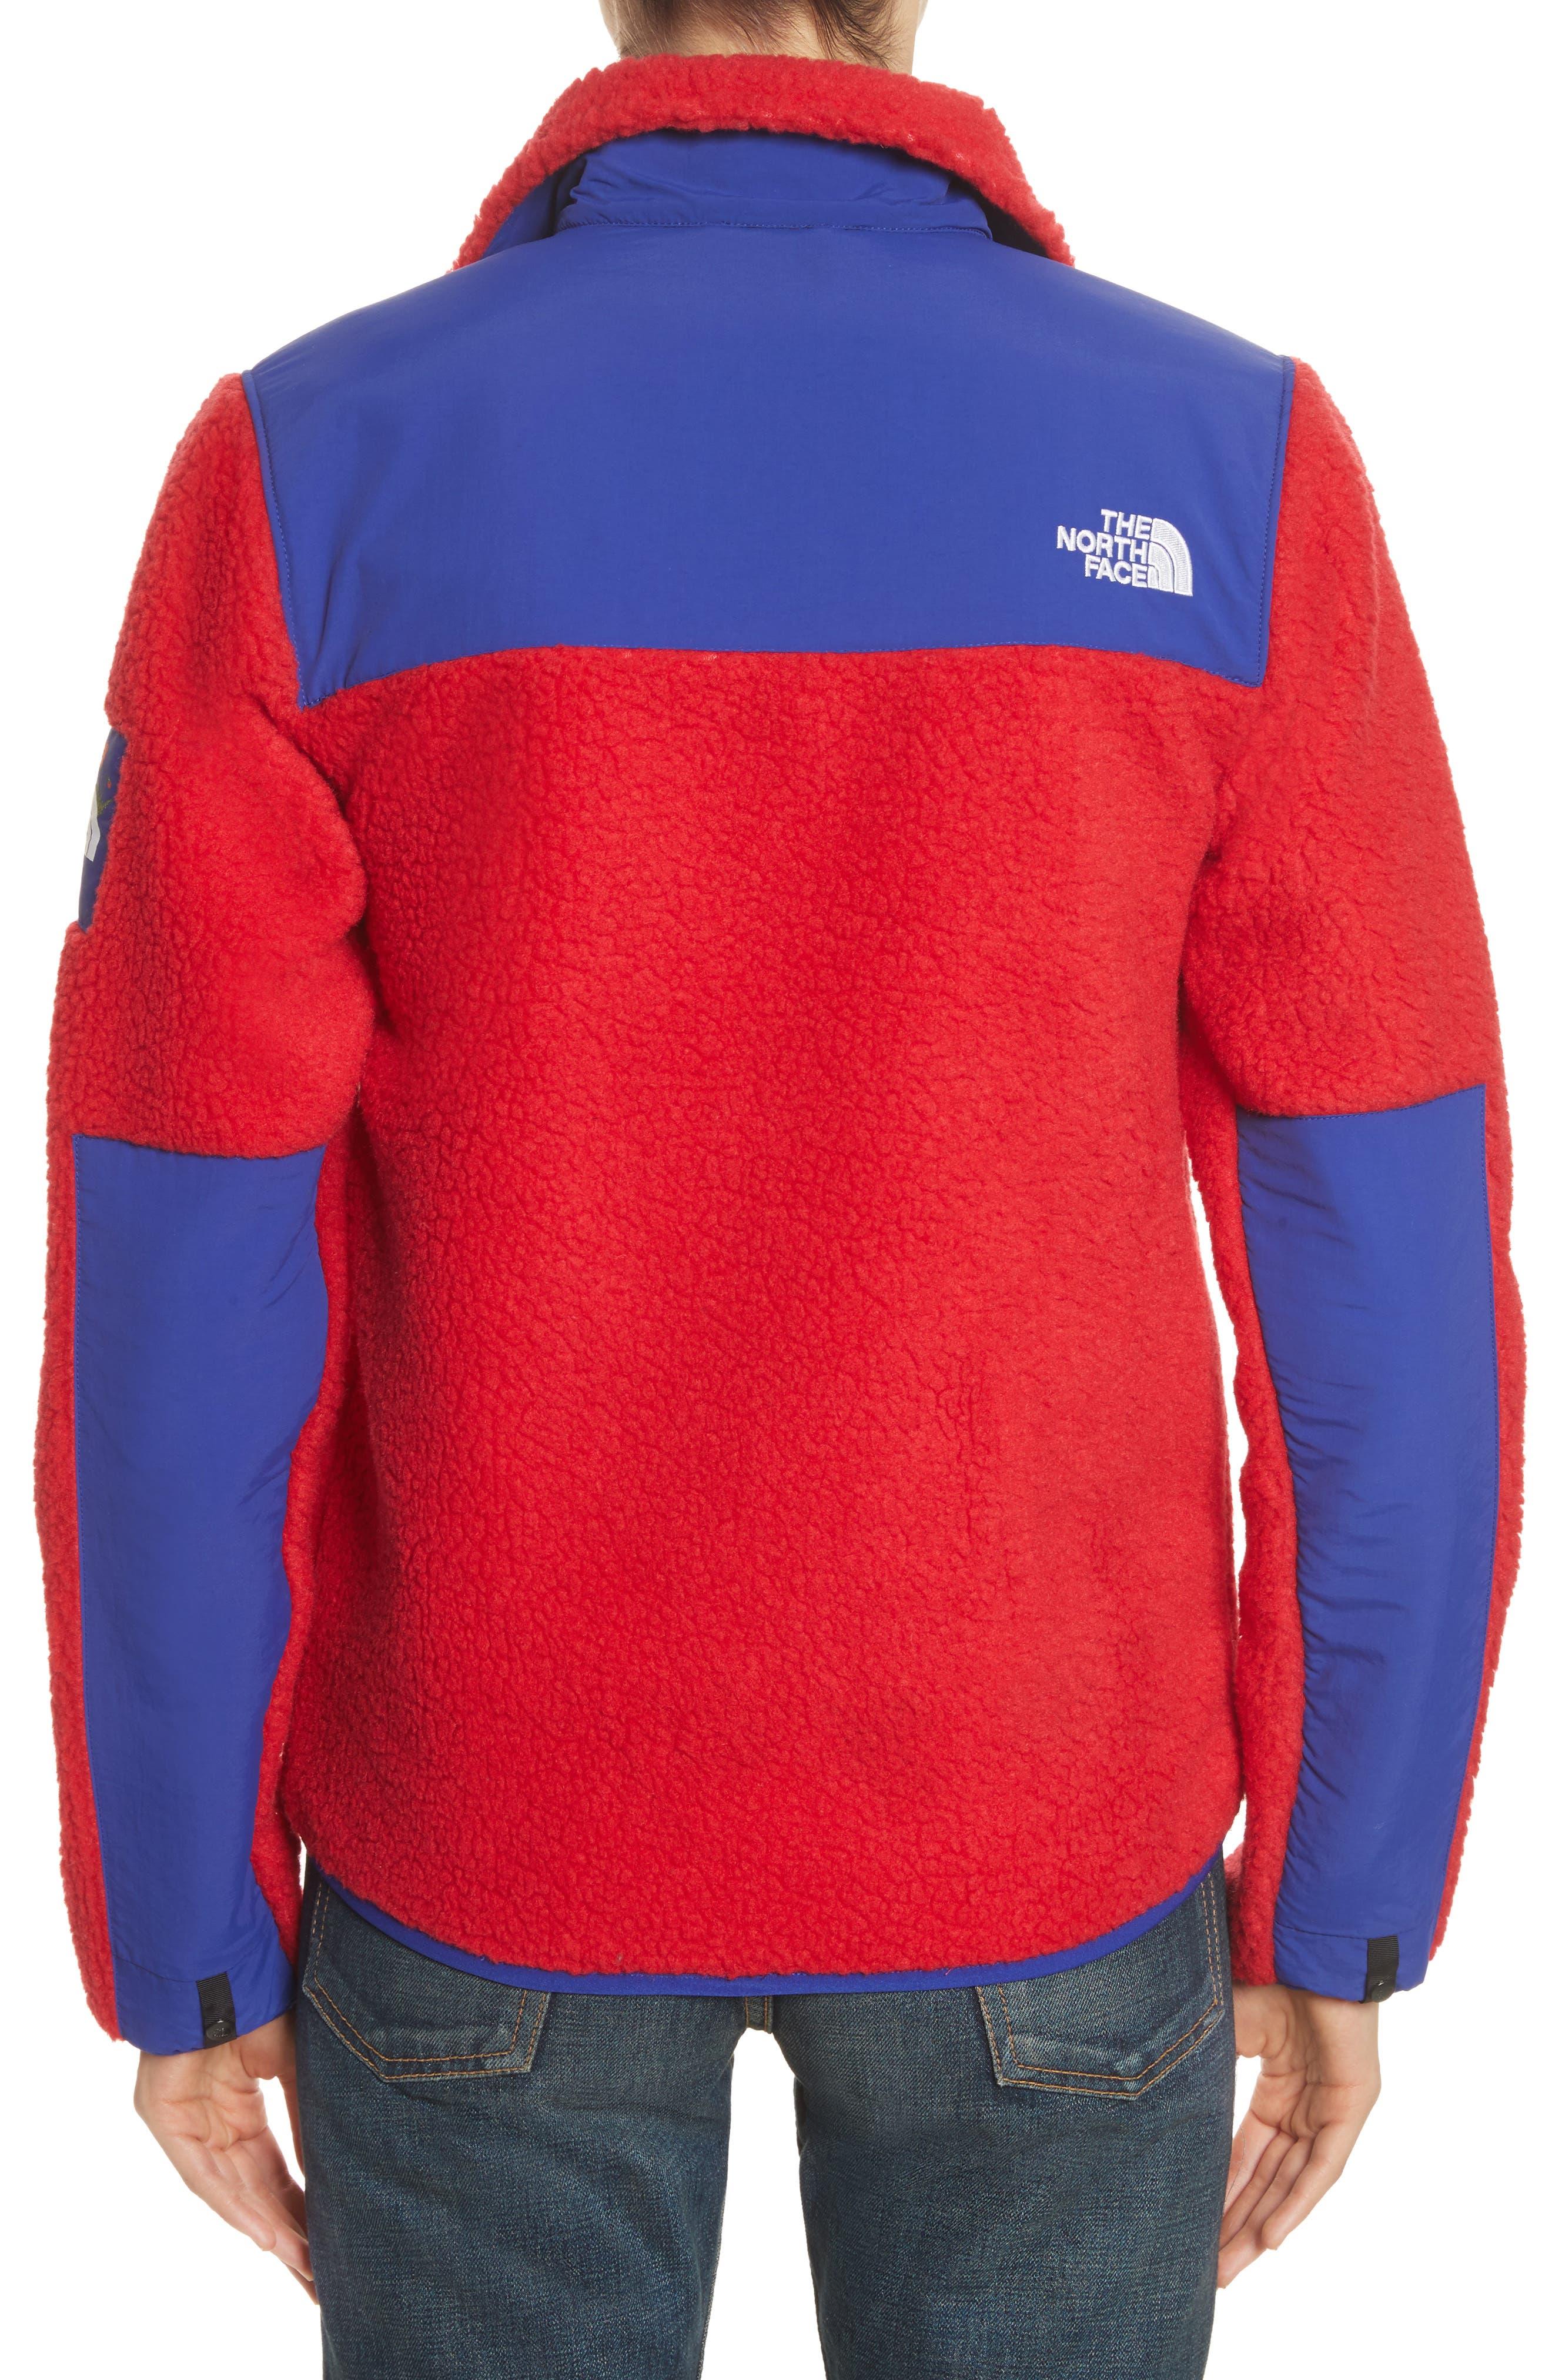 Denali Jacket,                             Alternate thumbnail 3, color,                             Tnf Red